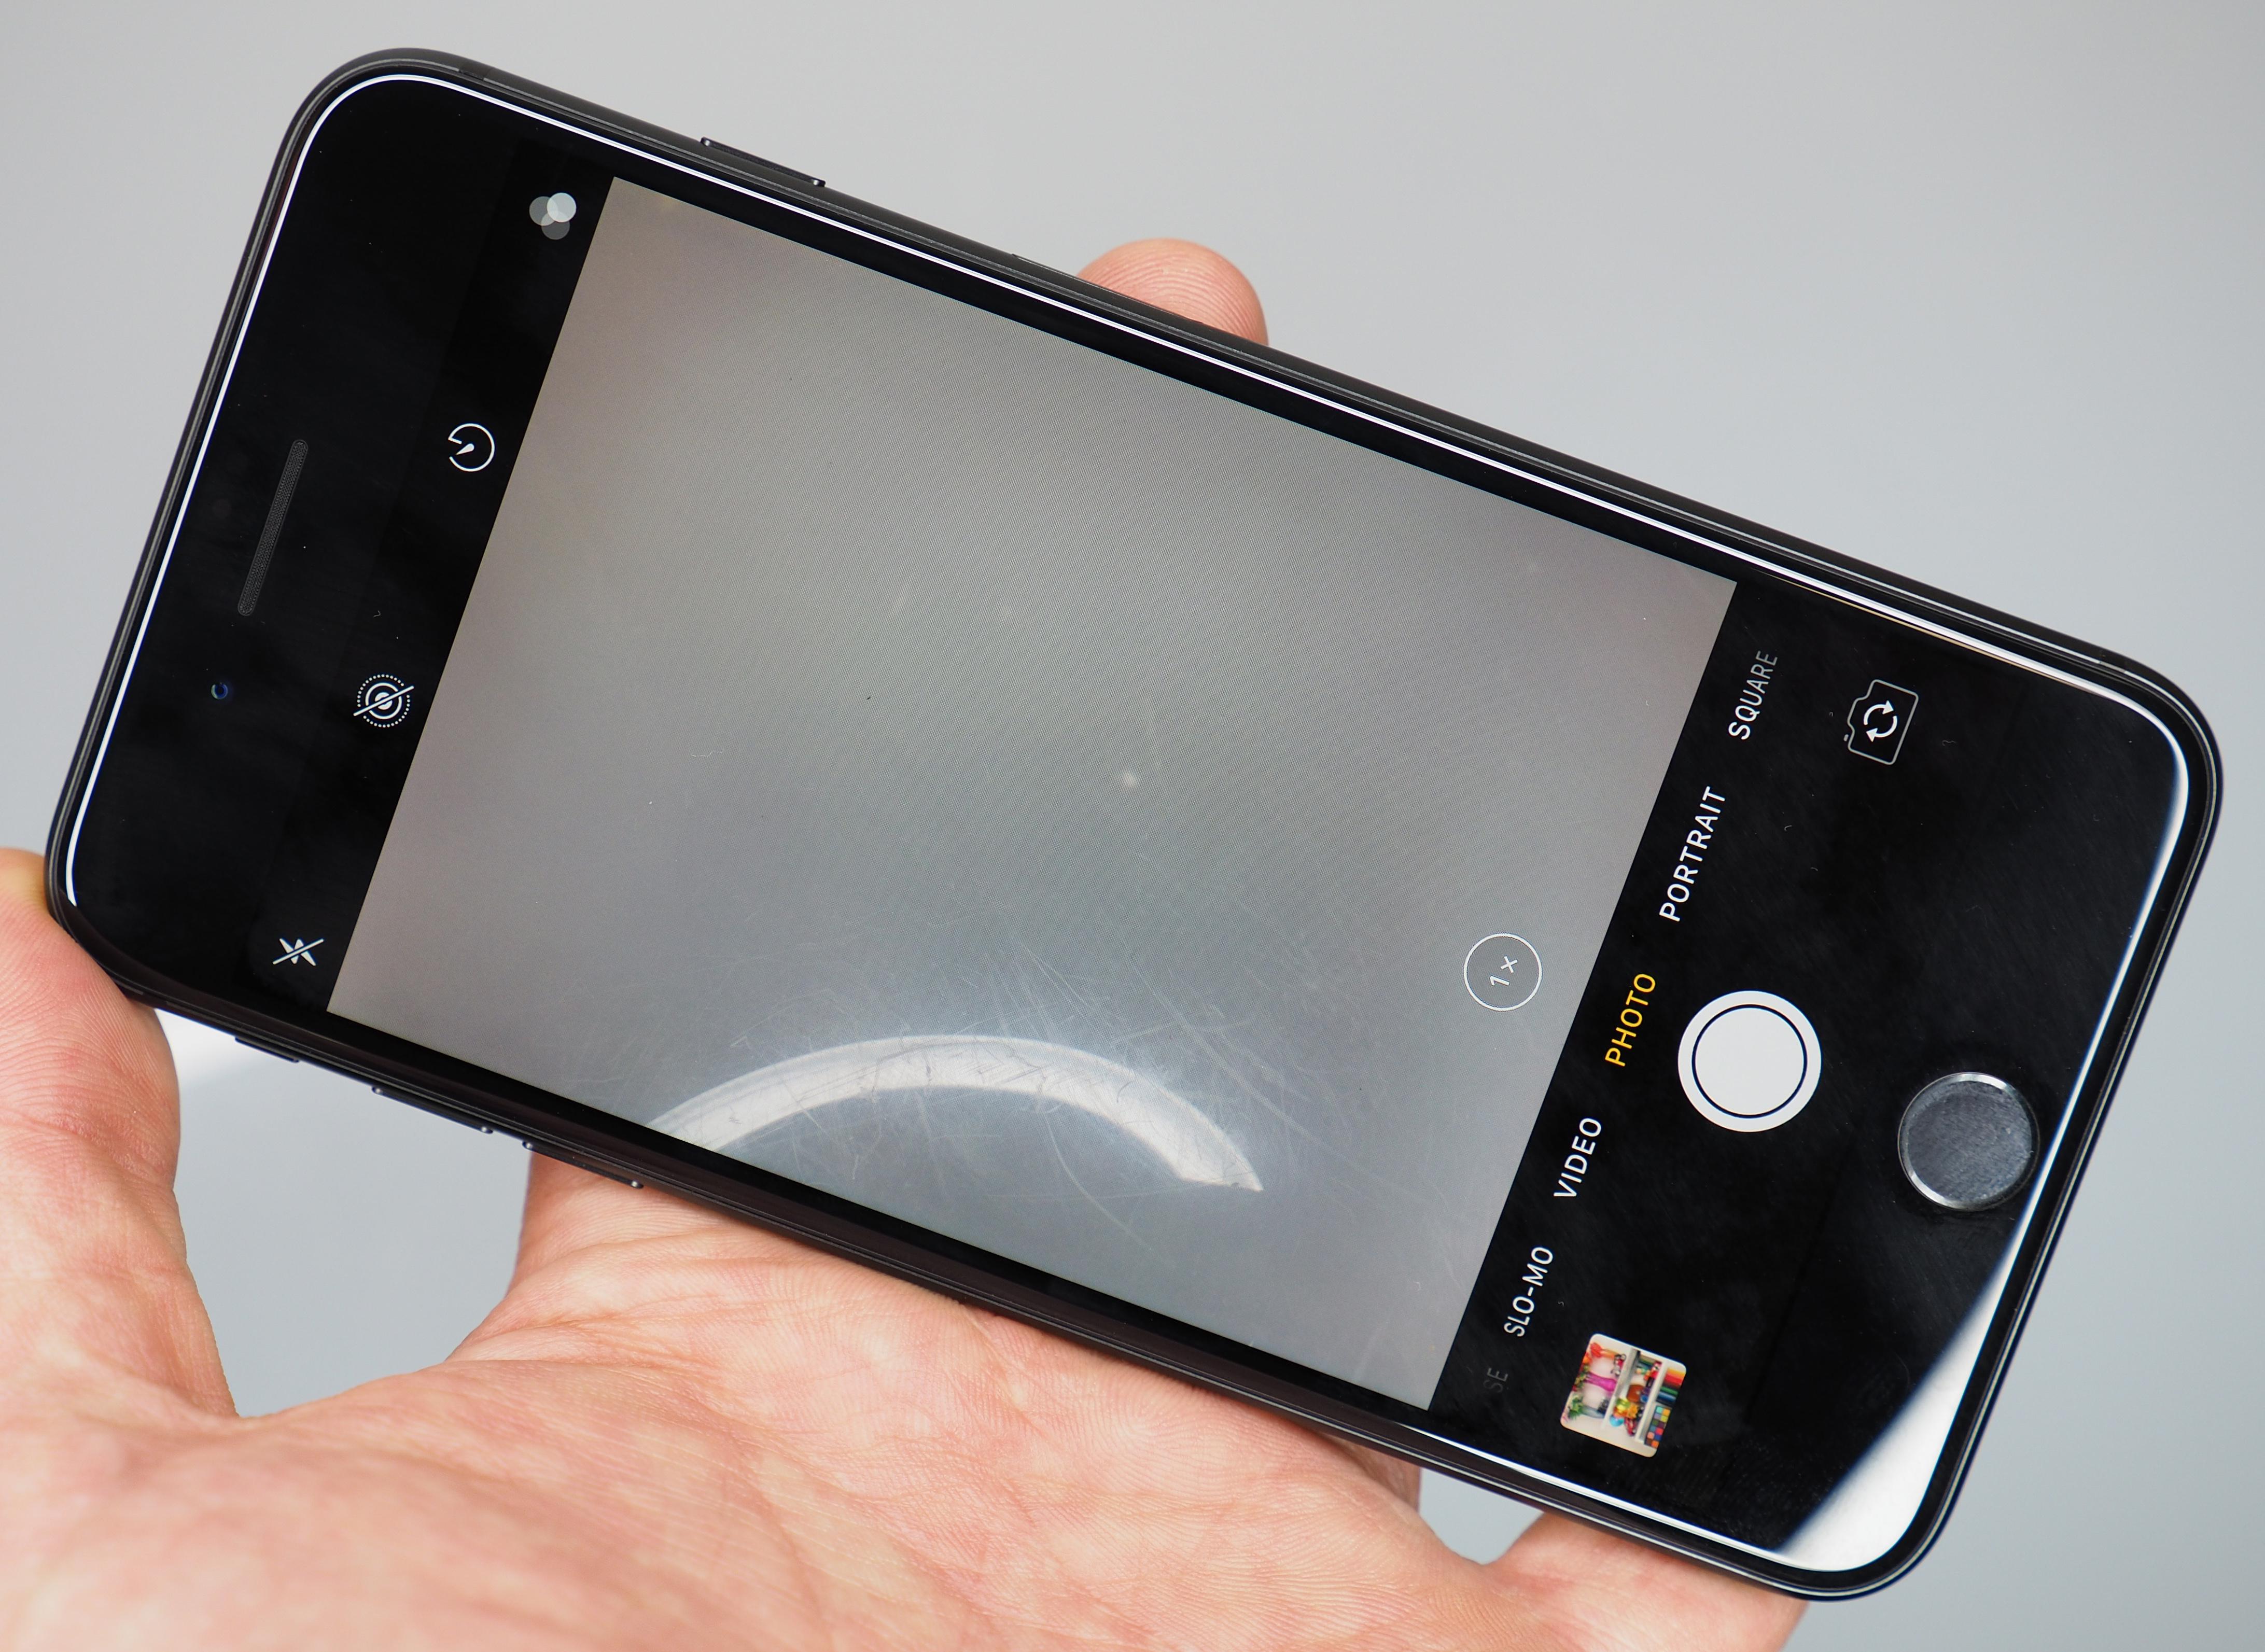 Apple iPhone 8 Plus Camera Review | ePHOTOzine